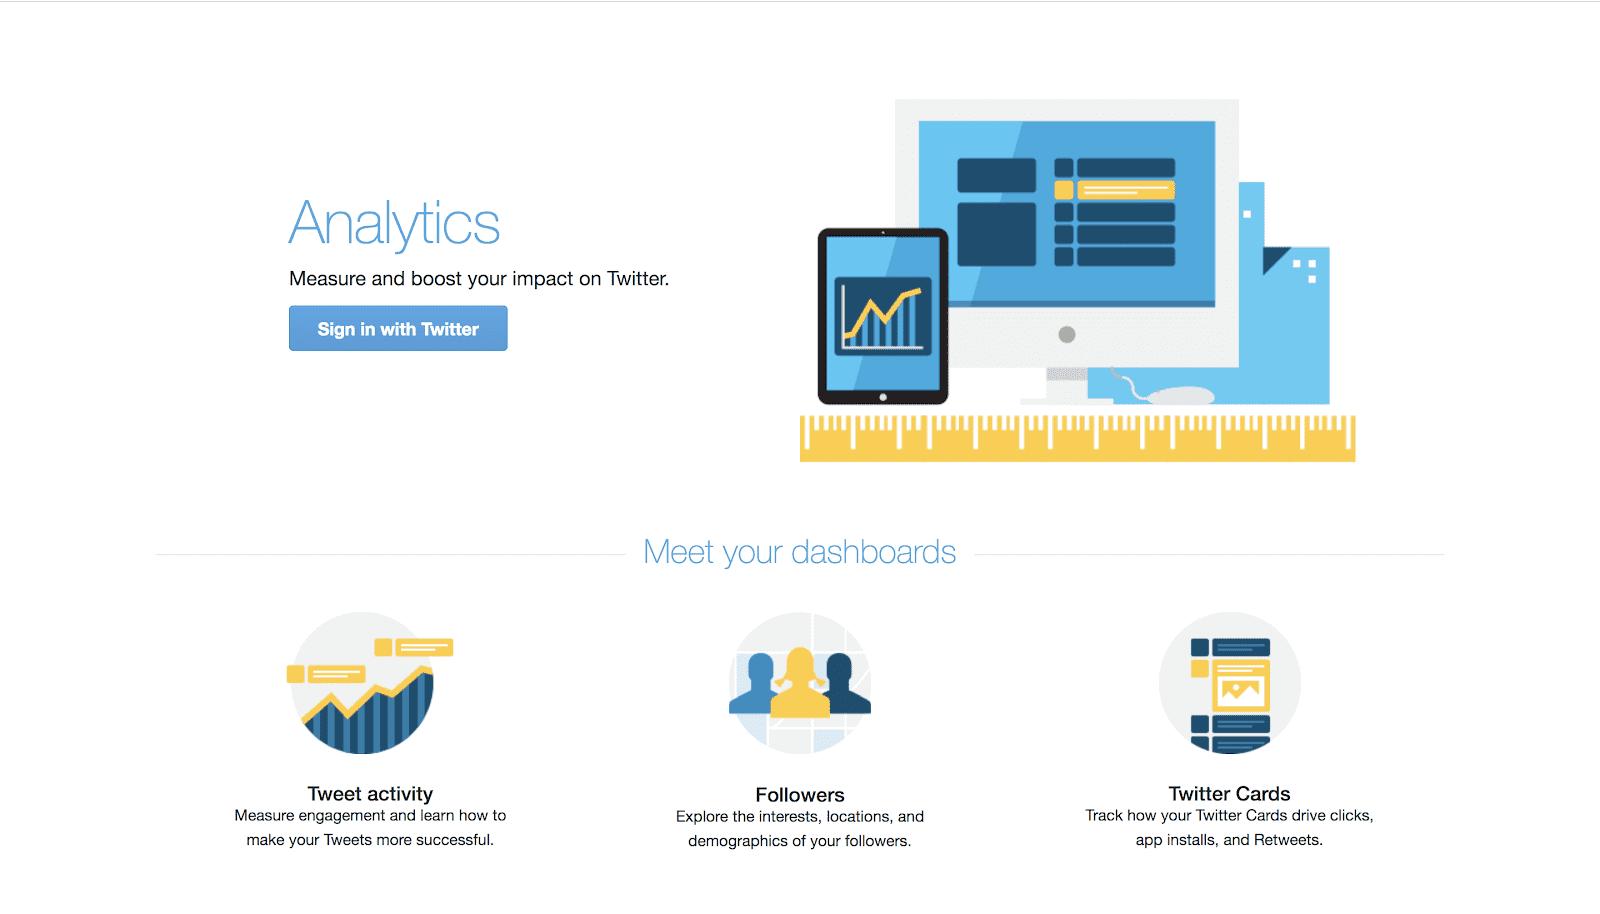 twitter-analytics-como-usar-passo-a-passo